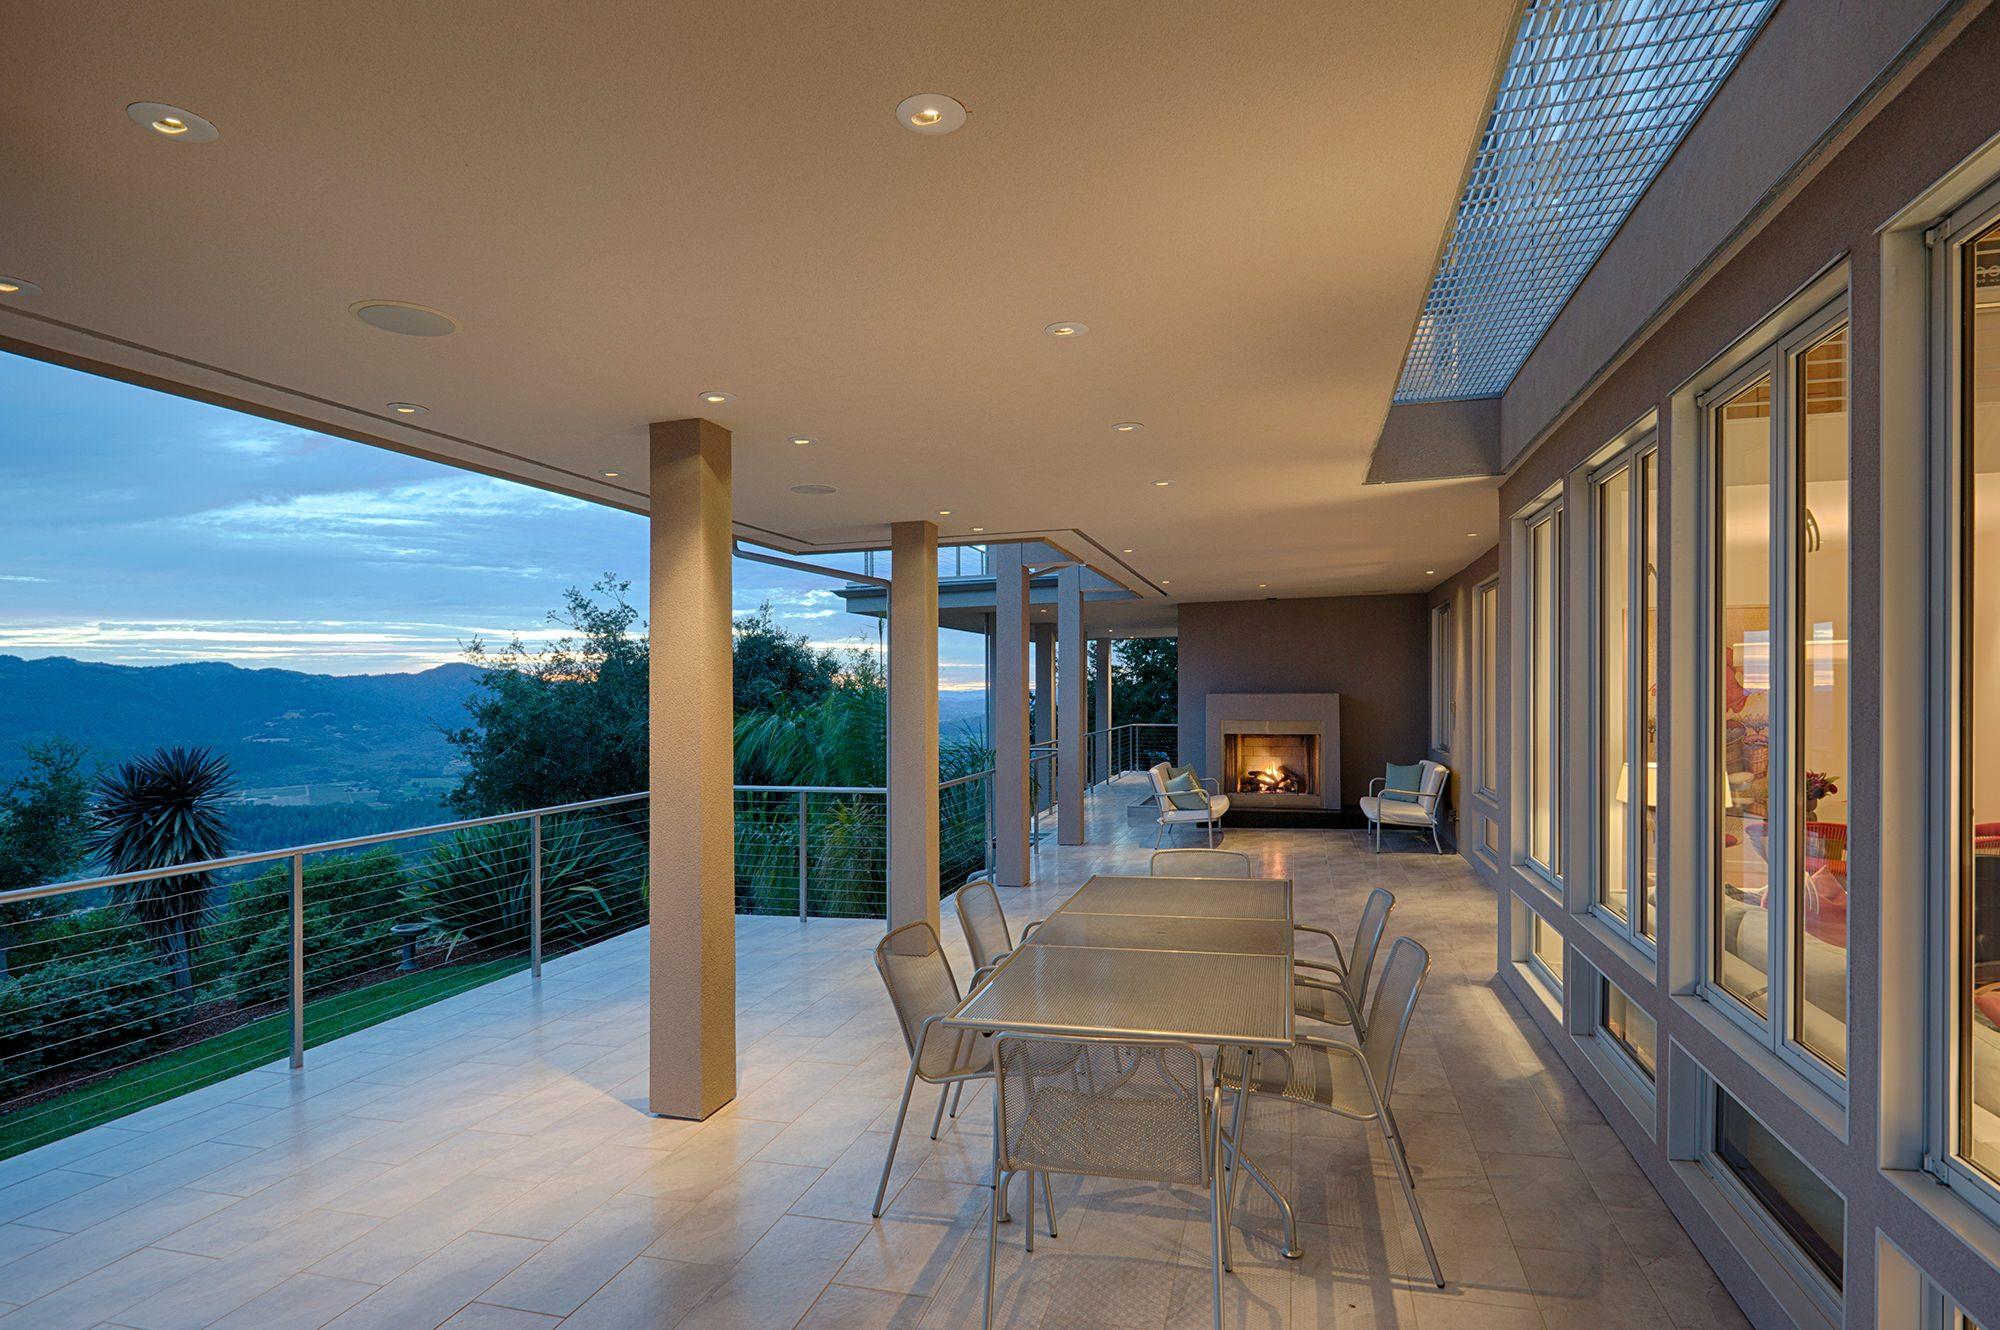 Outdoor patio overlooking Napa Valley